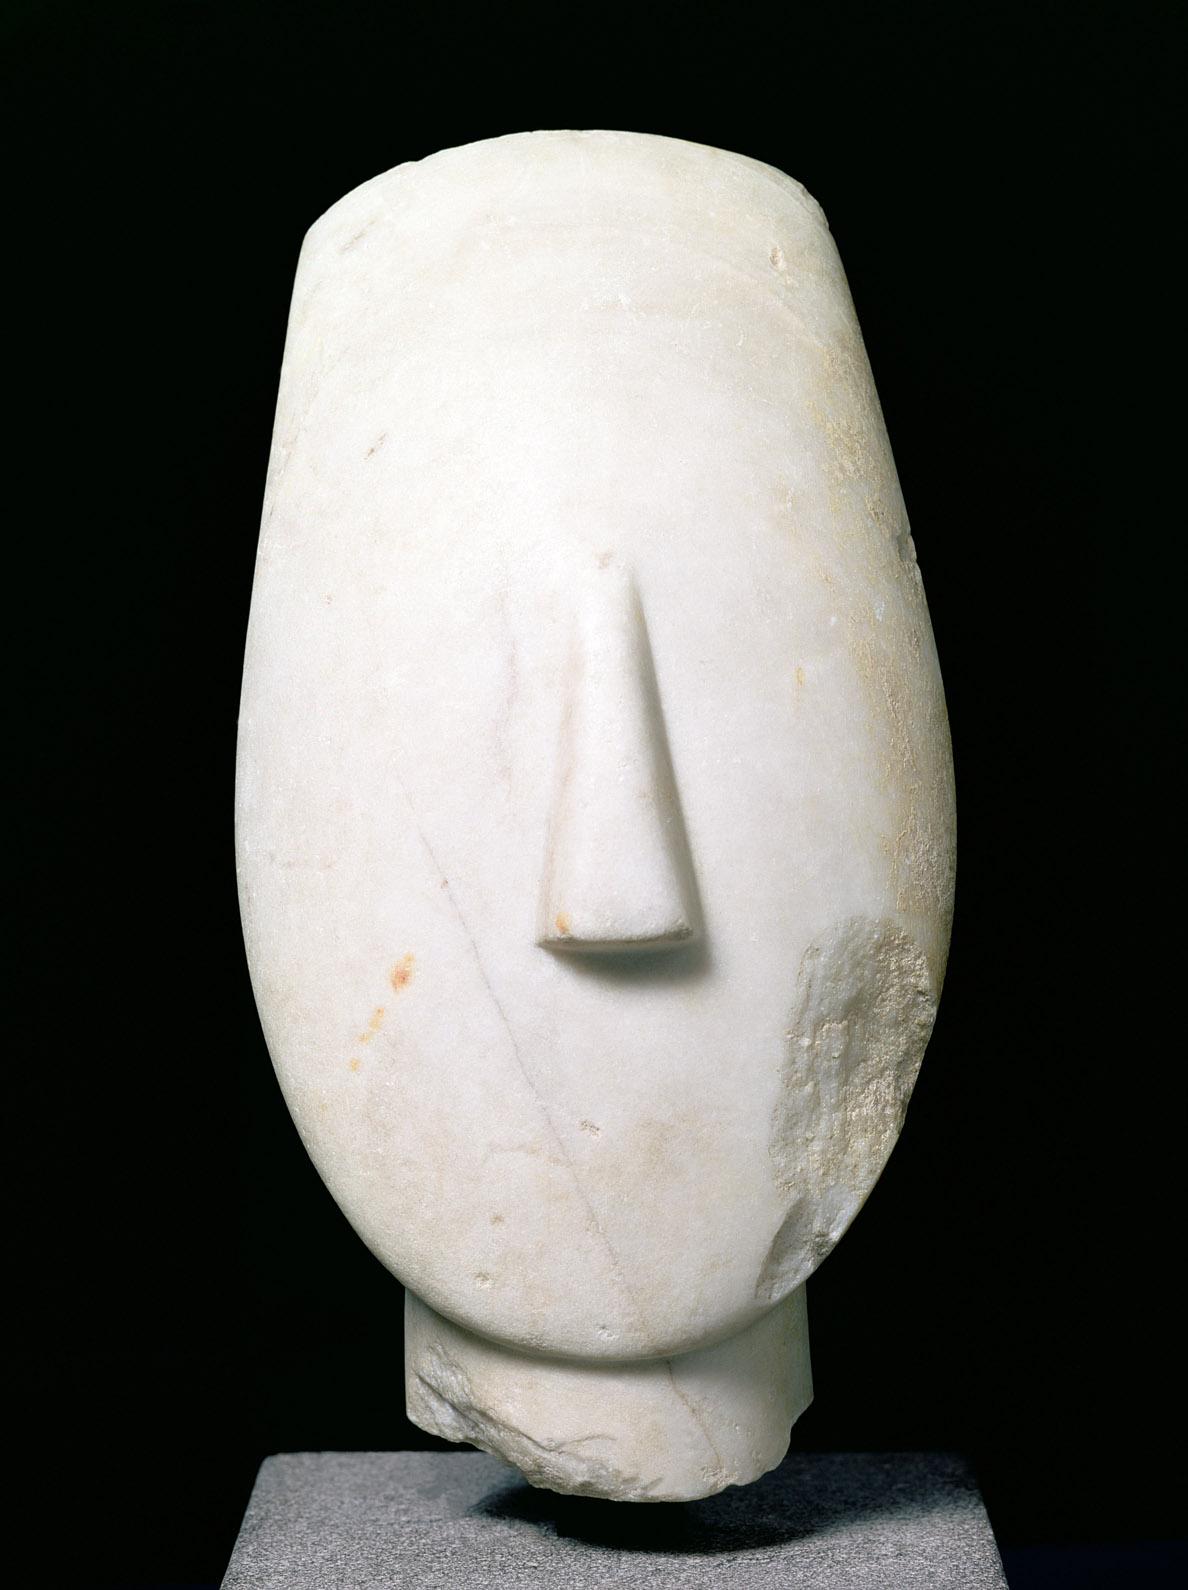 Head of Cycladic female statue, Keros, c. 2500 BC. © Louvre/Giraudon/The Bridgeman Art Library International.